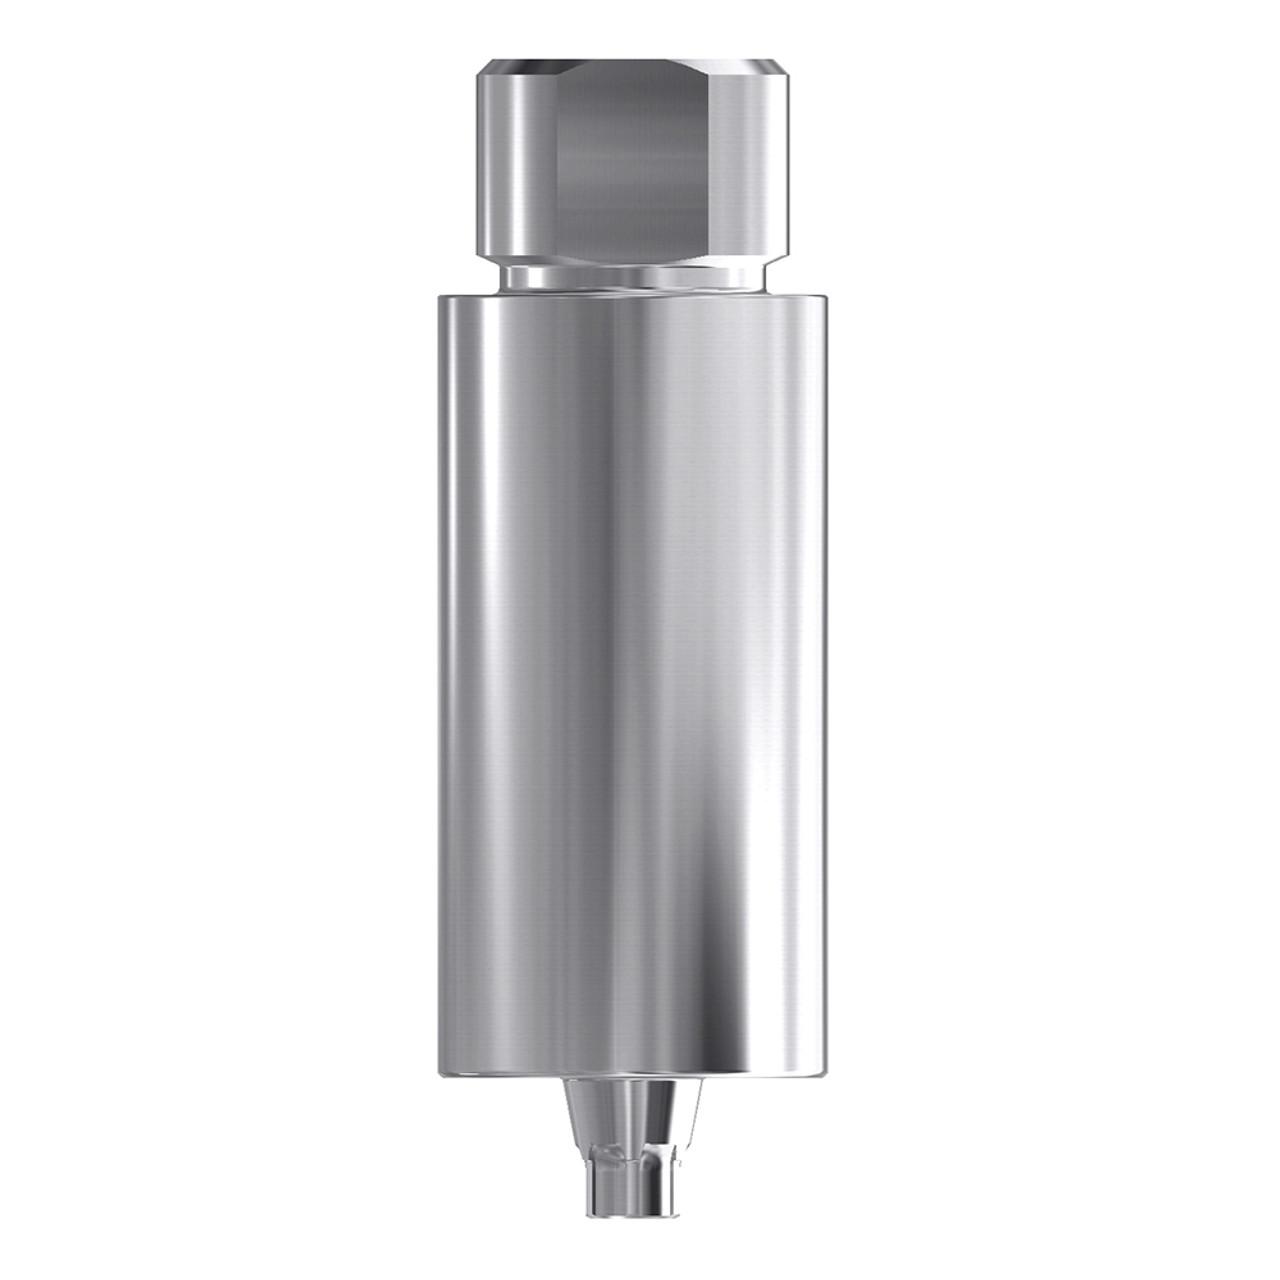 Pre-Milled Blank - Titanium (Astra EV Compatible)